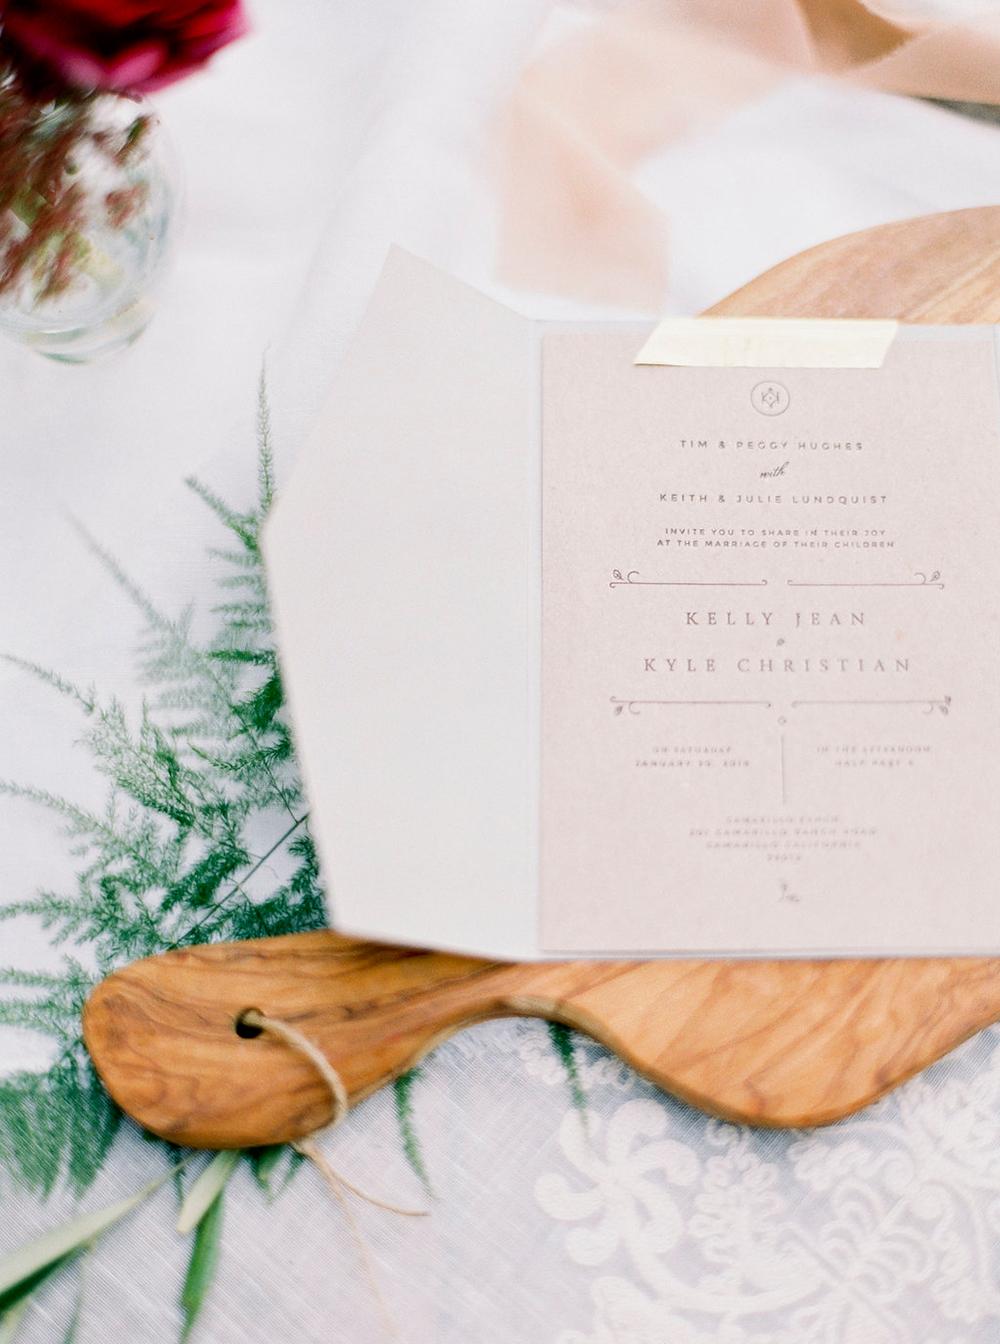 wedding stationery - photo by Amanda Lenhardt https://ruffledblog.com/relaxed-san-juan-capistrano-wedding-inspiration